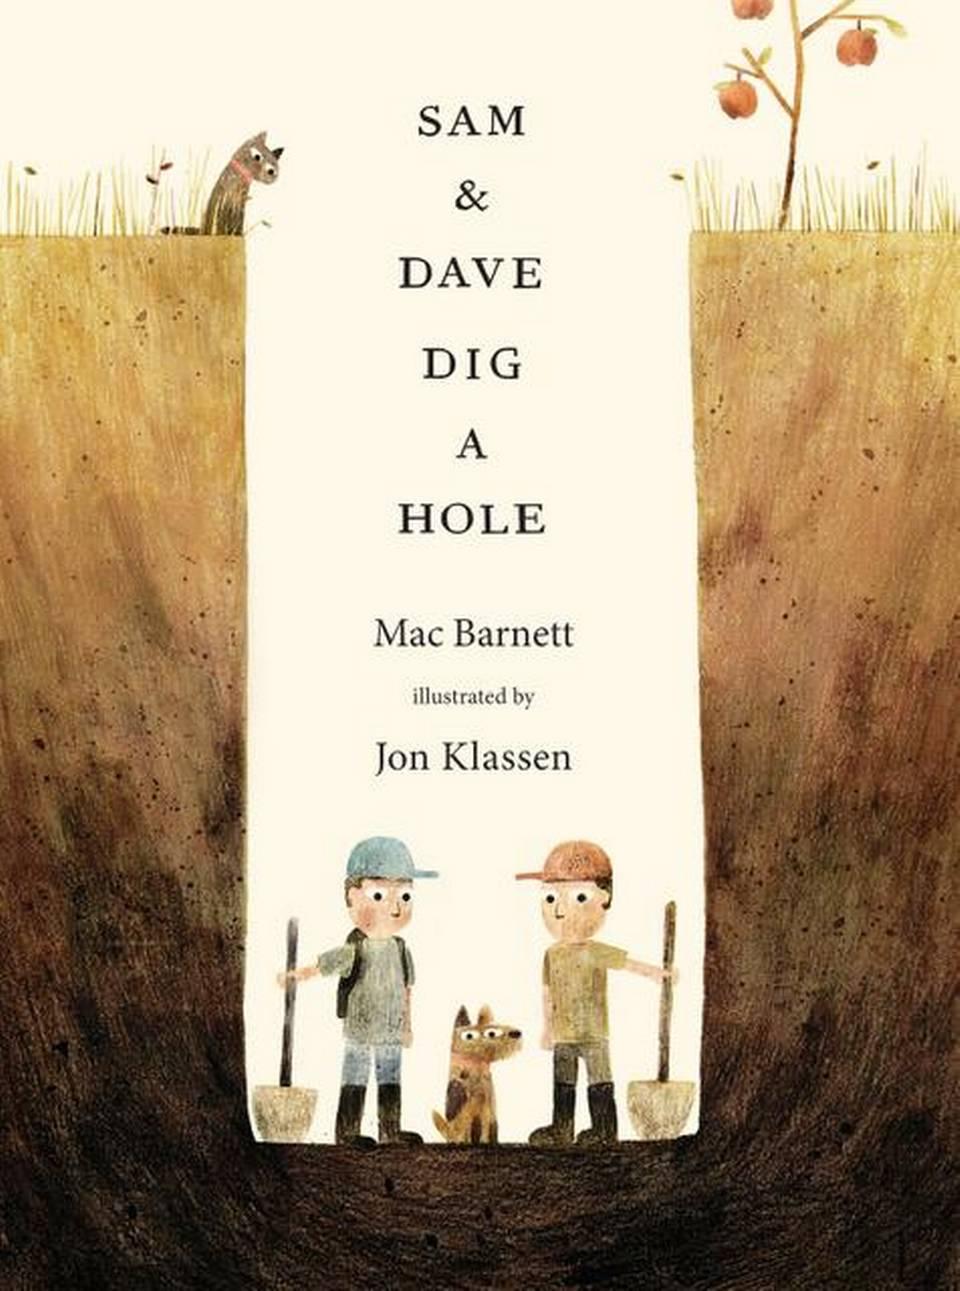 Sam And Dave Dig A Hole, by Mac Barnett